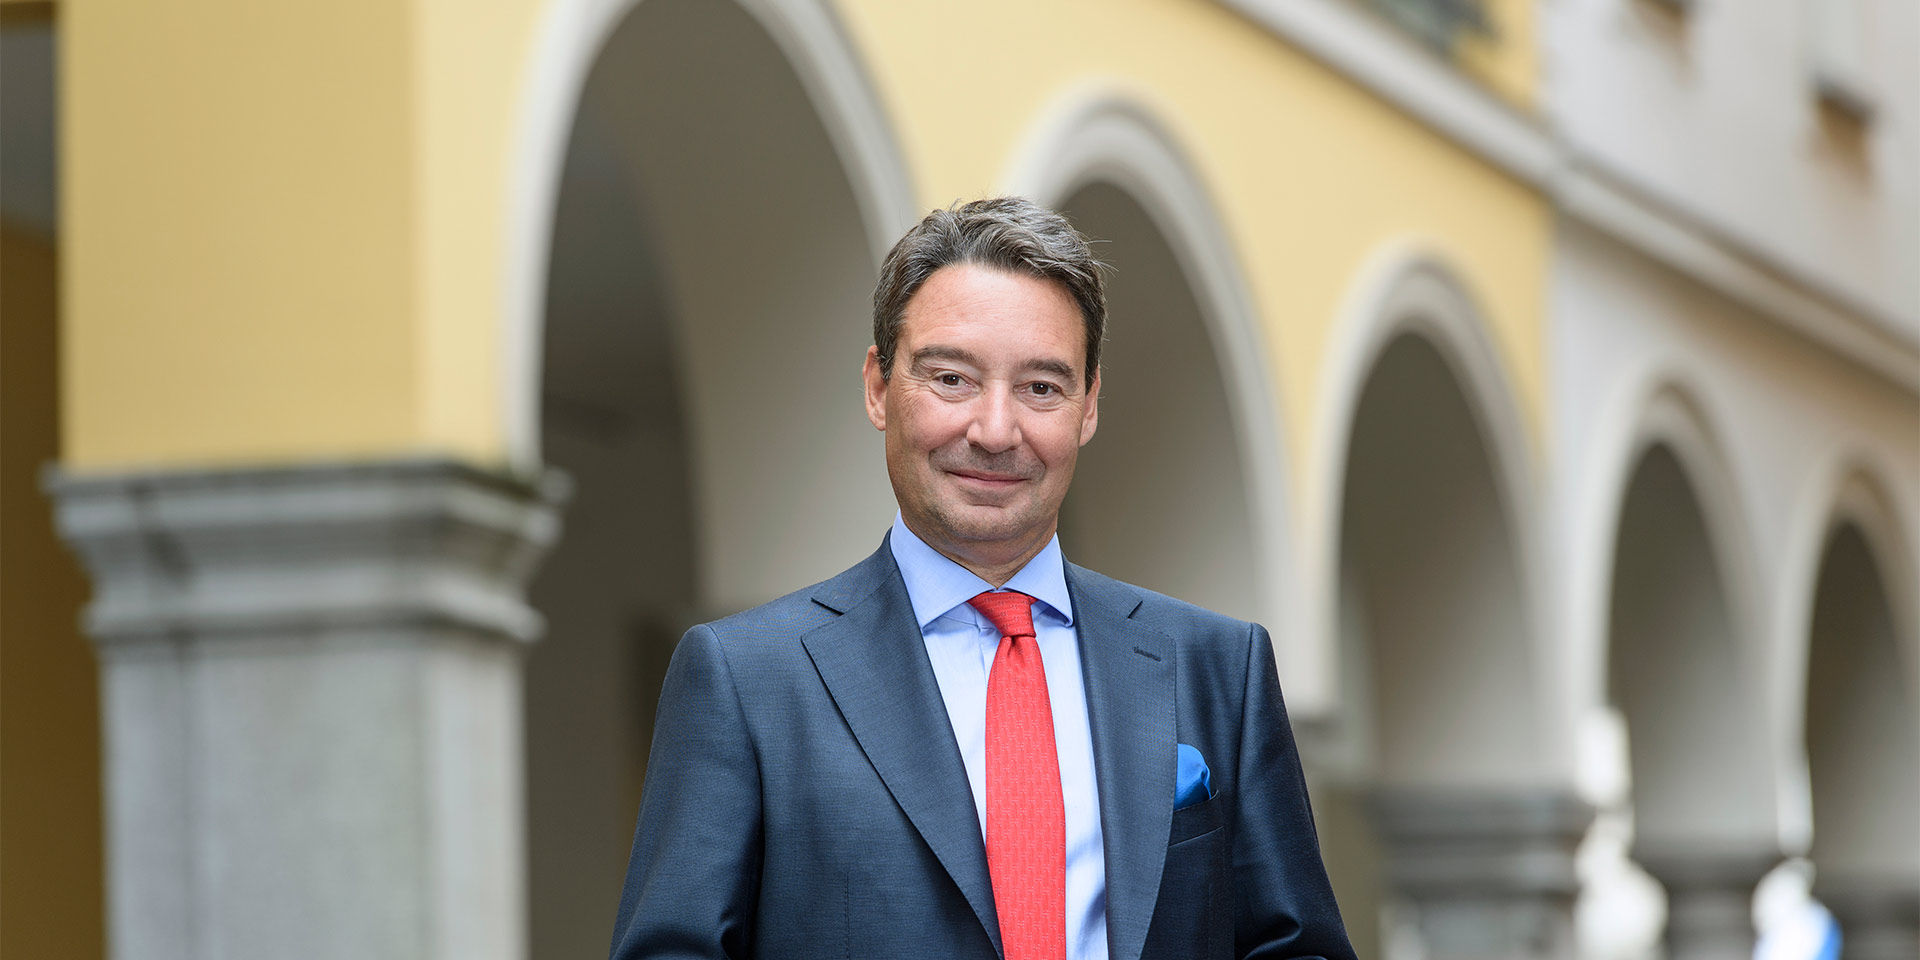 Serge Pavoncello